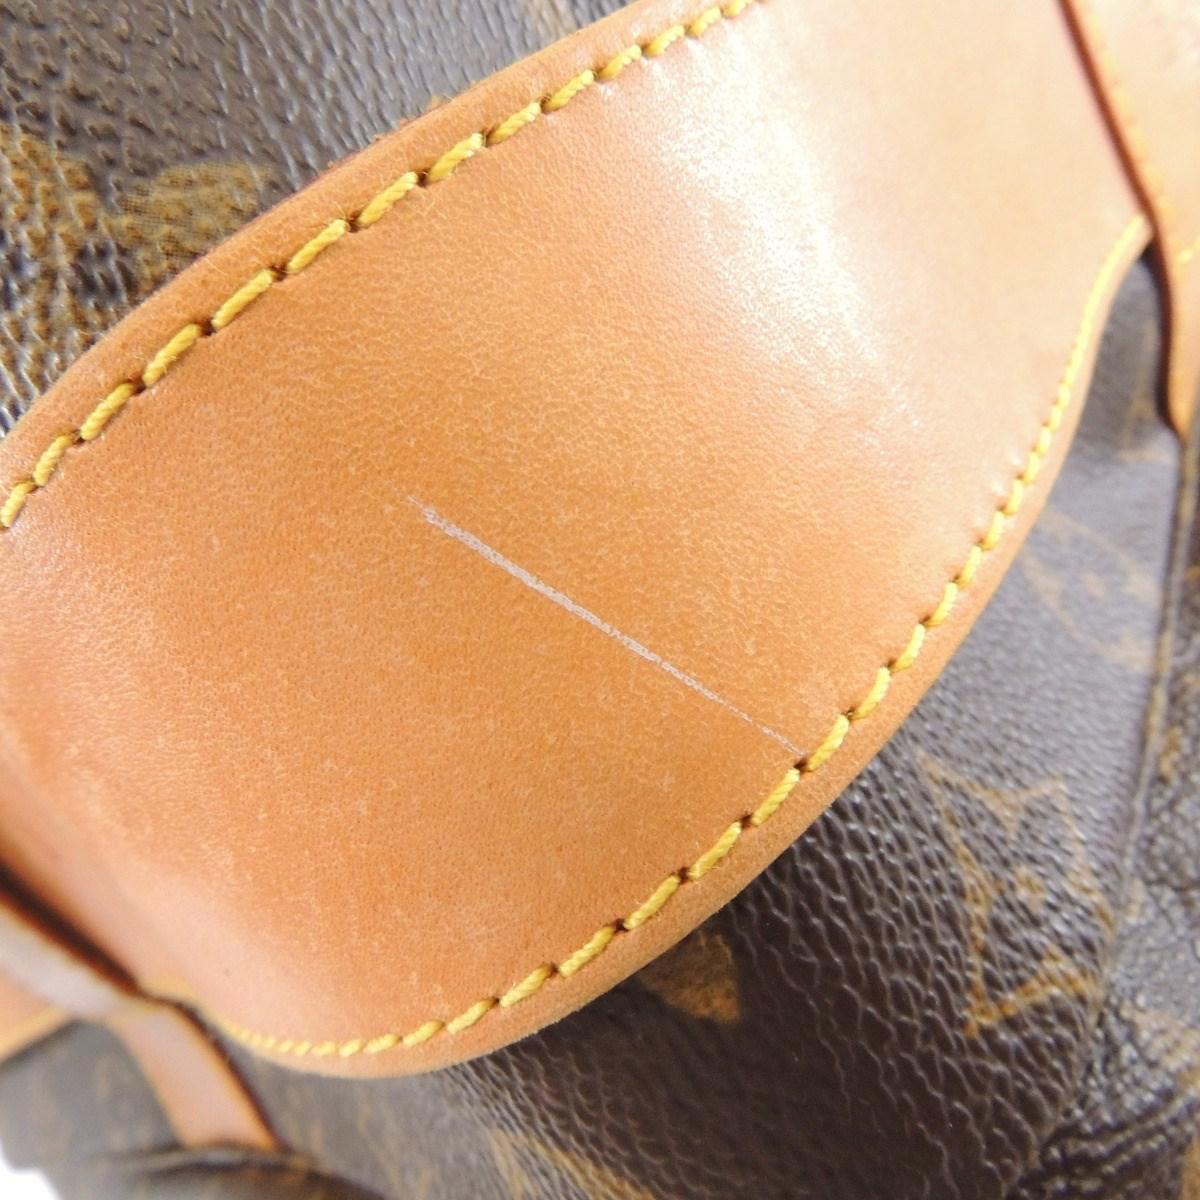 0afd83f16743 Lyst - Louis Vuitton Monogram Canvas Shoulder Bag Special Order ...